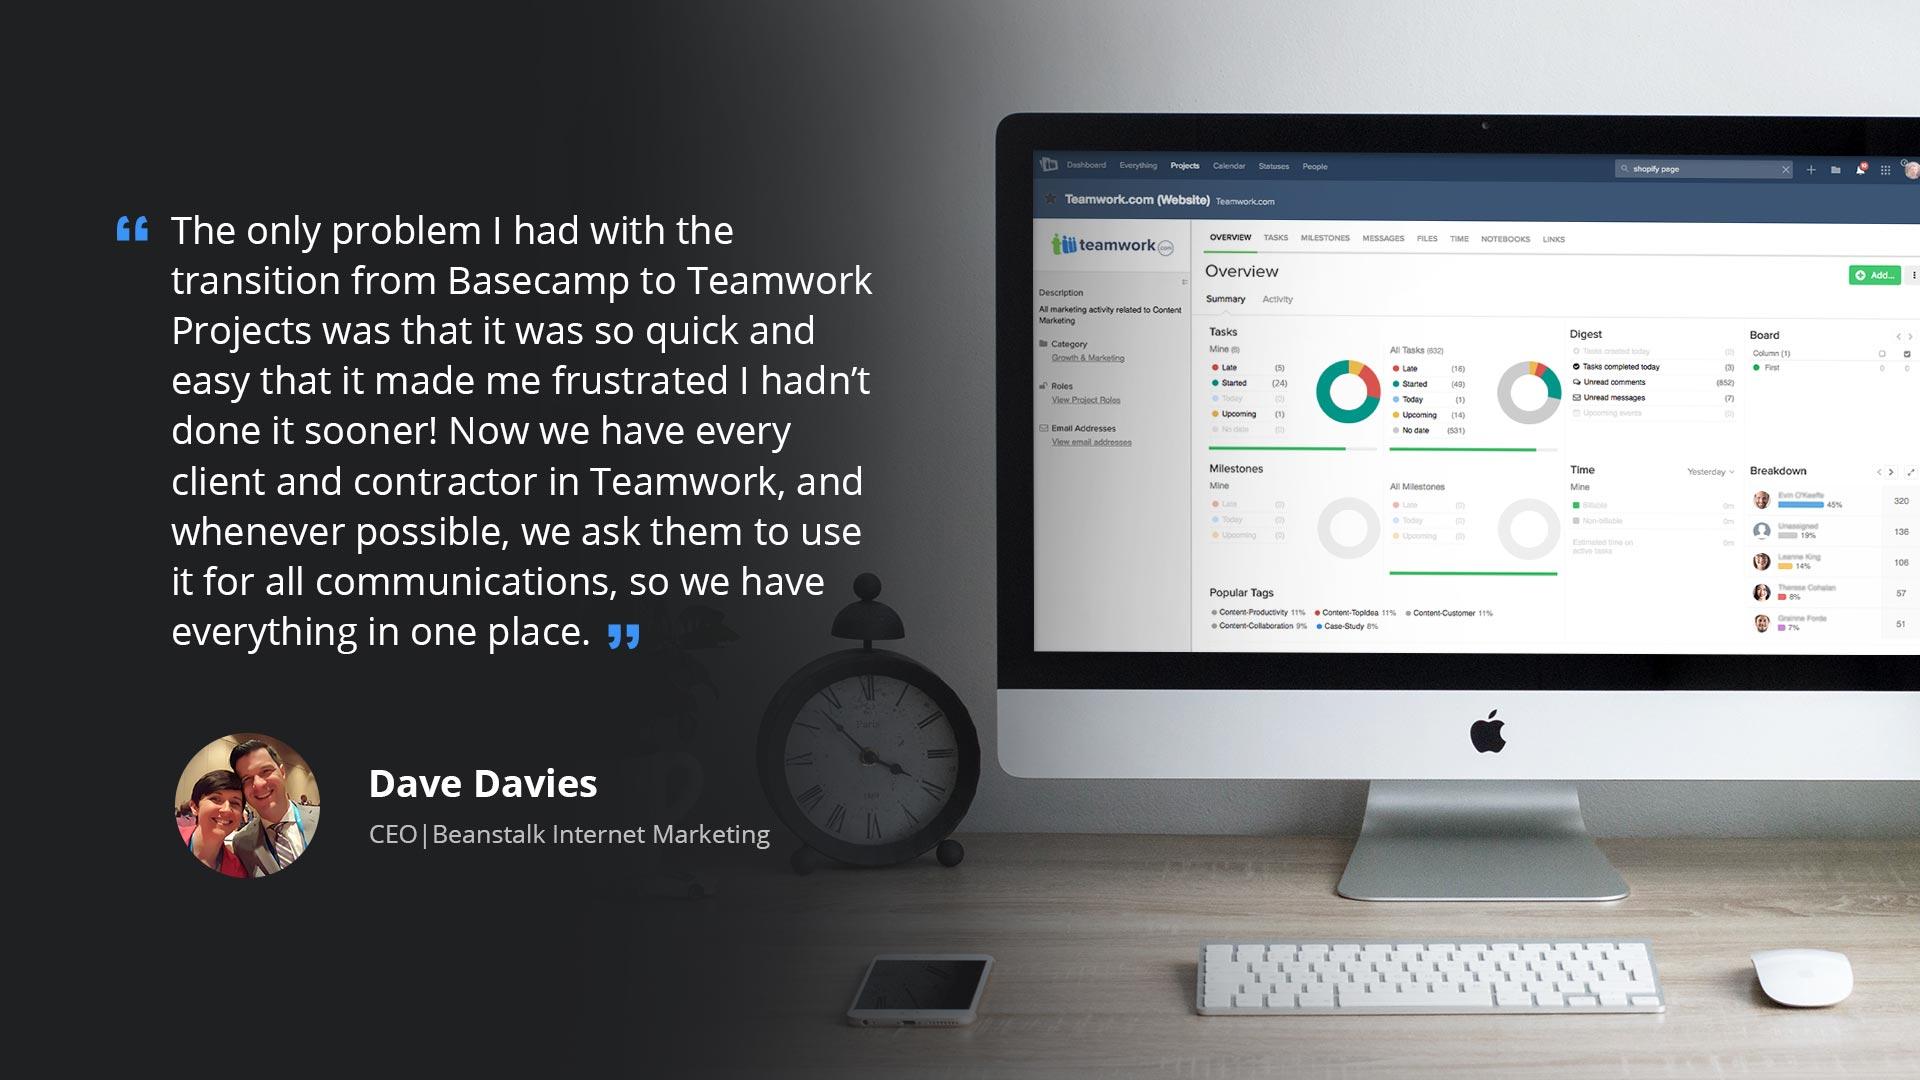 Superior Time Tracking Tools Transform Business at Every Level | Beanstalk Internet Marketing | Teamwork.com